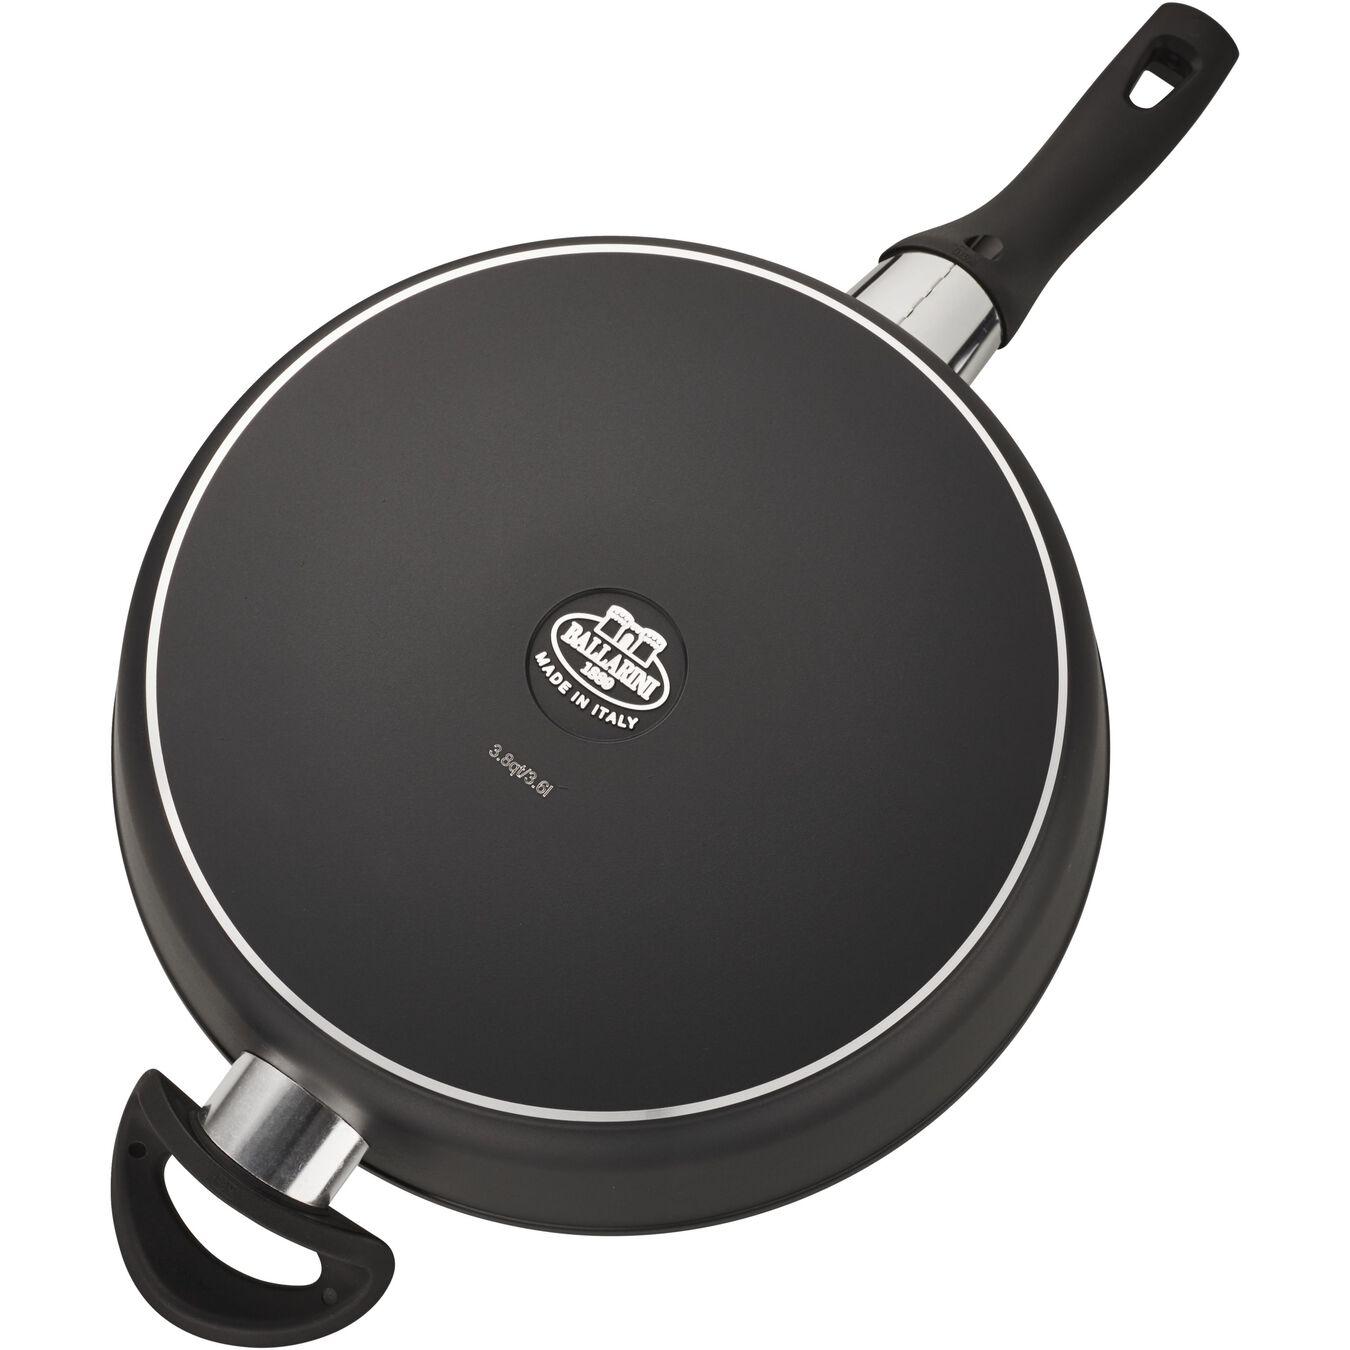 3.8-qt Nonstick Saute Pan with Lid,,large 2